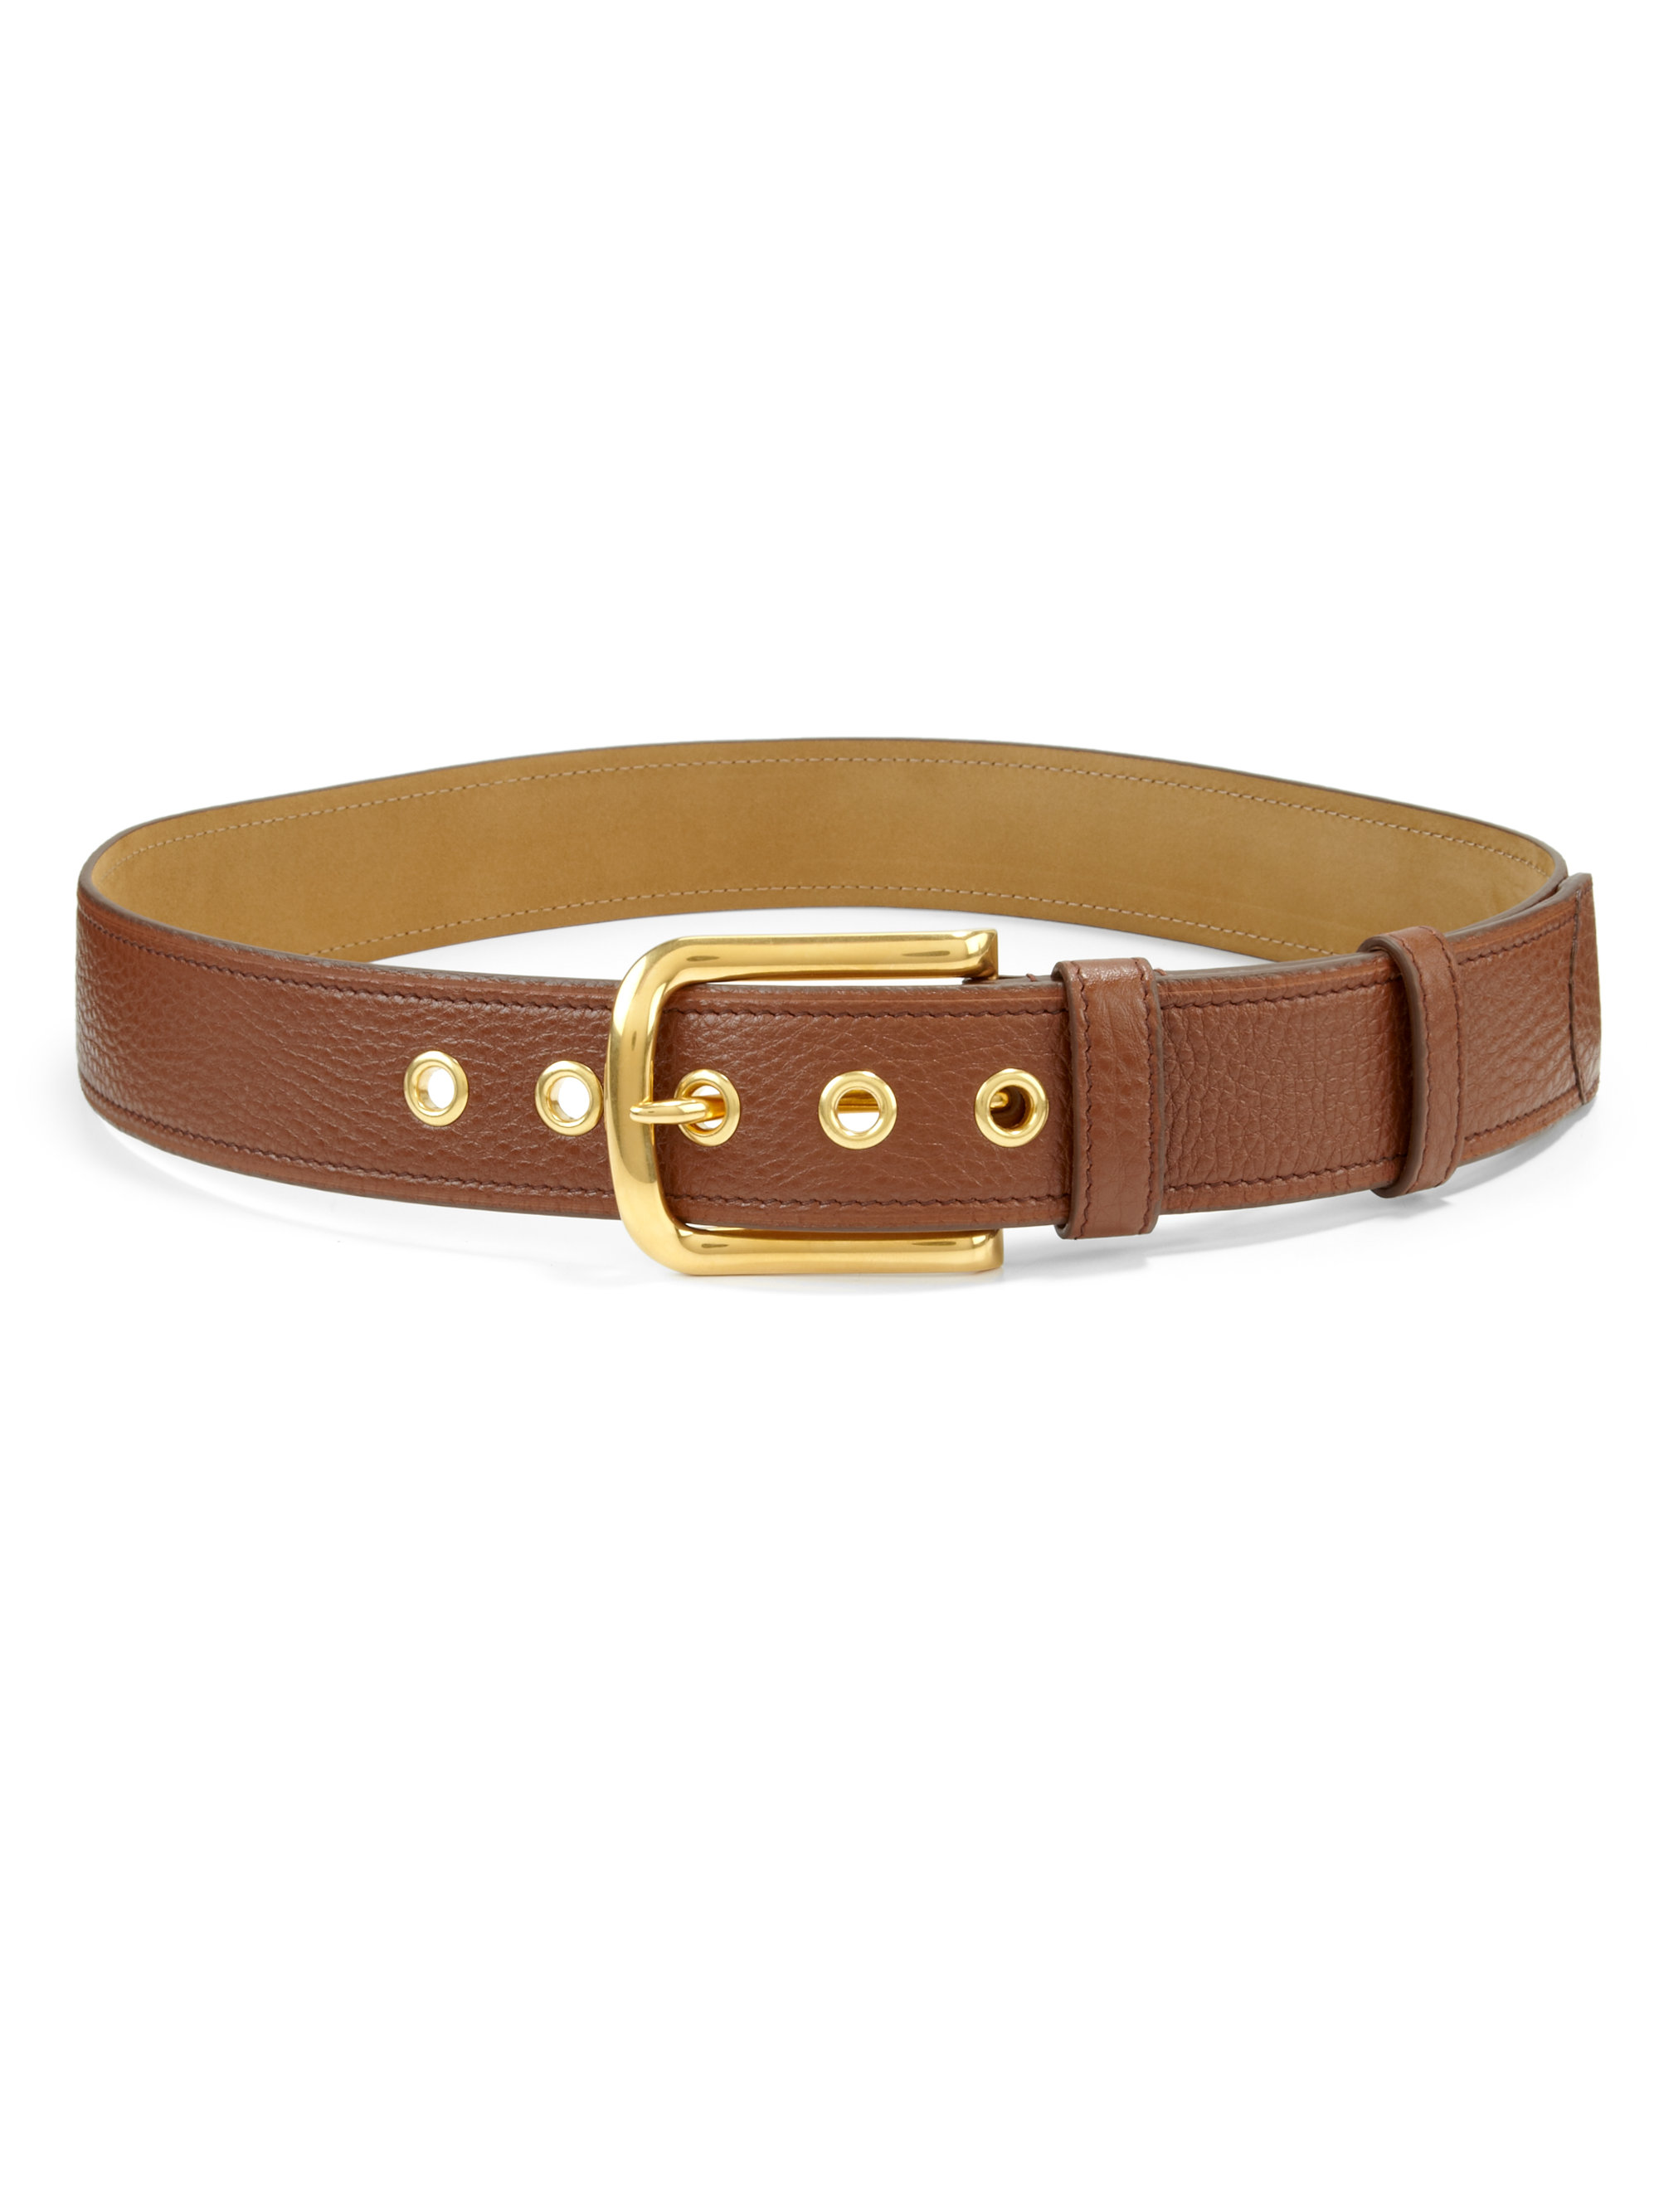 Prada Classic Daino Leather Belt in Brown   Lyst